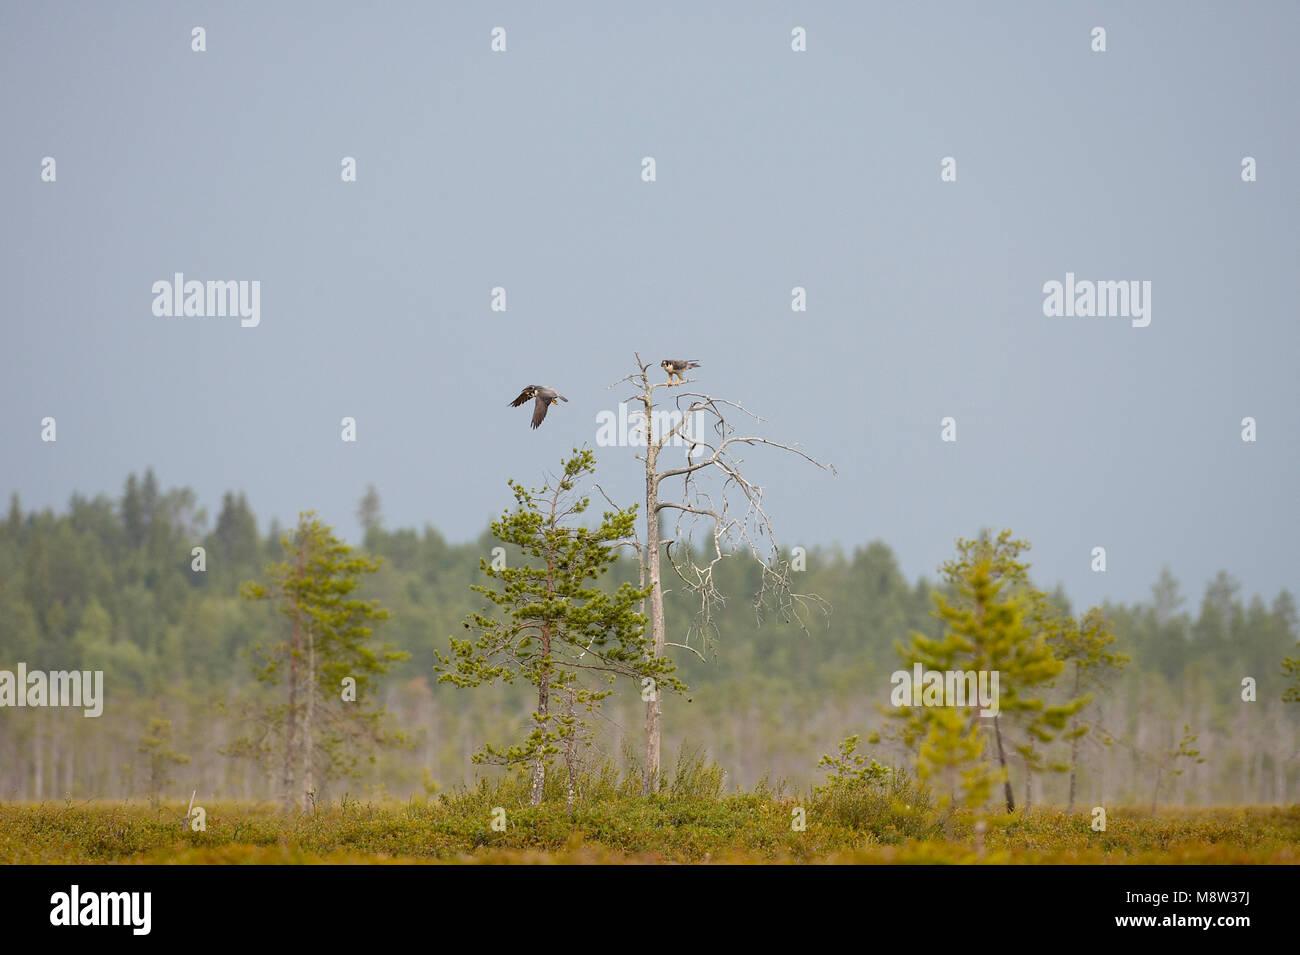 Slechtvalk, Peregrine Falcon, Falco peregrinus - Stock Image